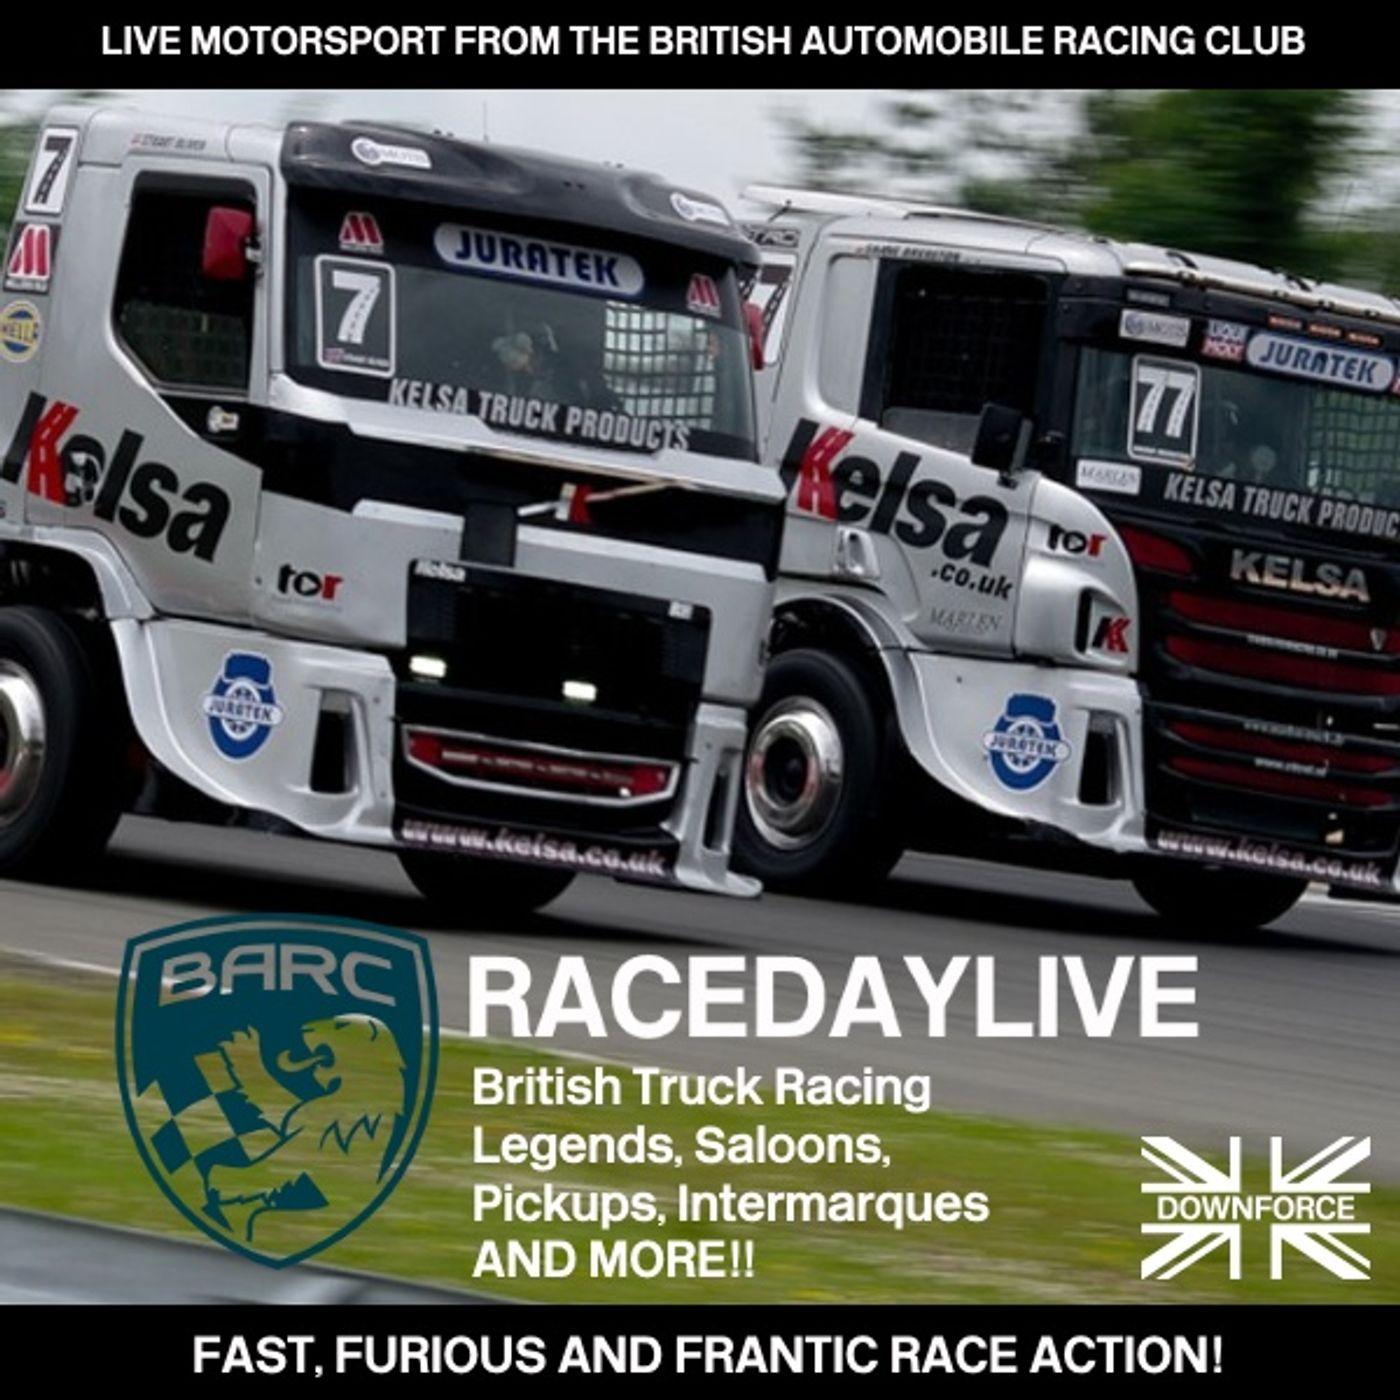 BARC #RaceDayLive